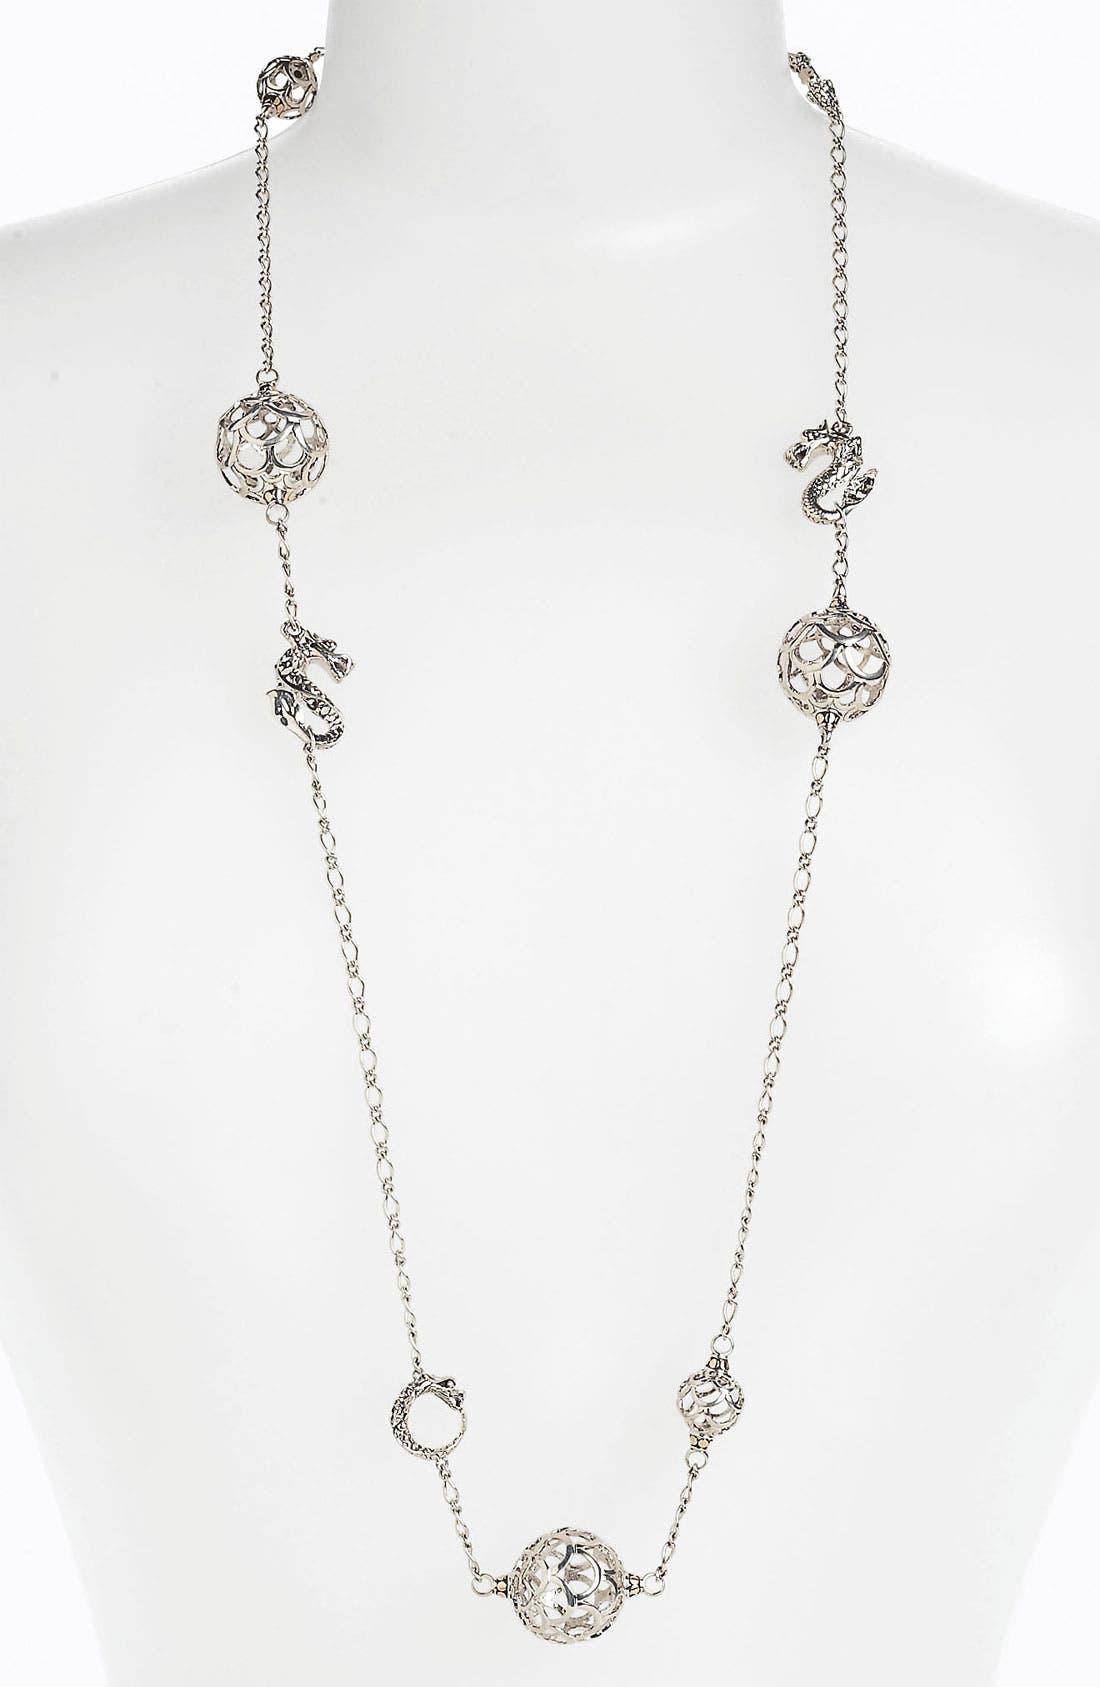 Main Image - John Hardy 'Naga Gold & Silver' Long Sautoir Necklace